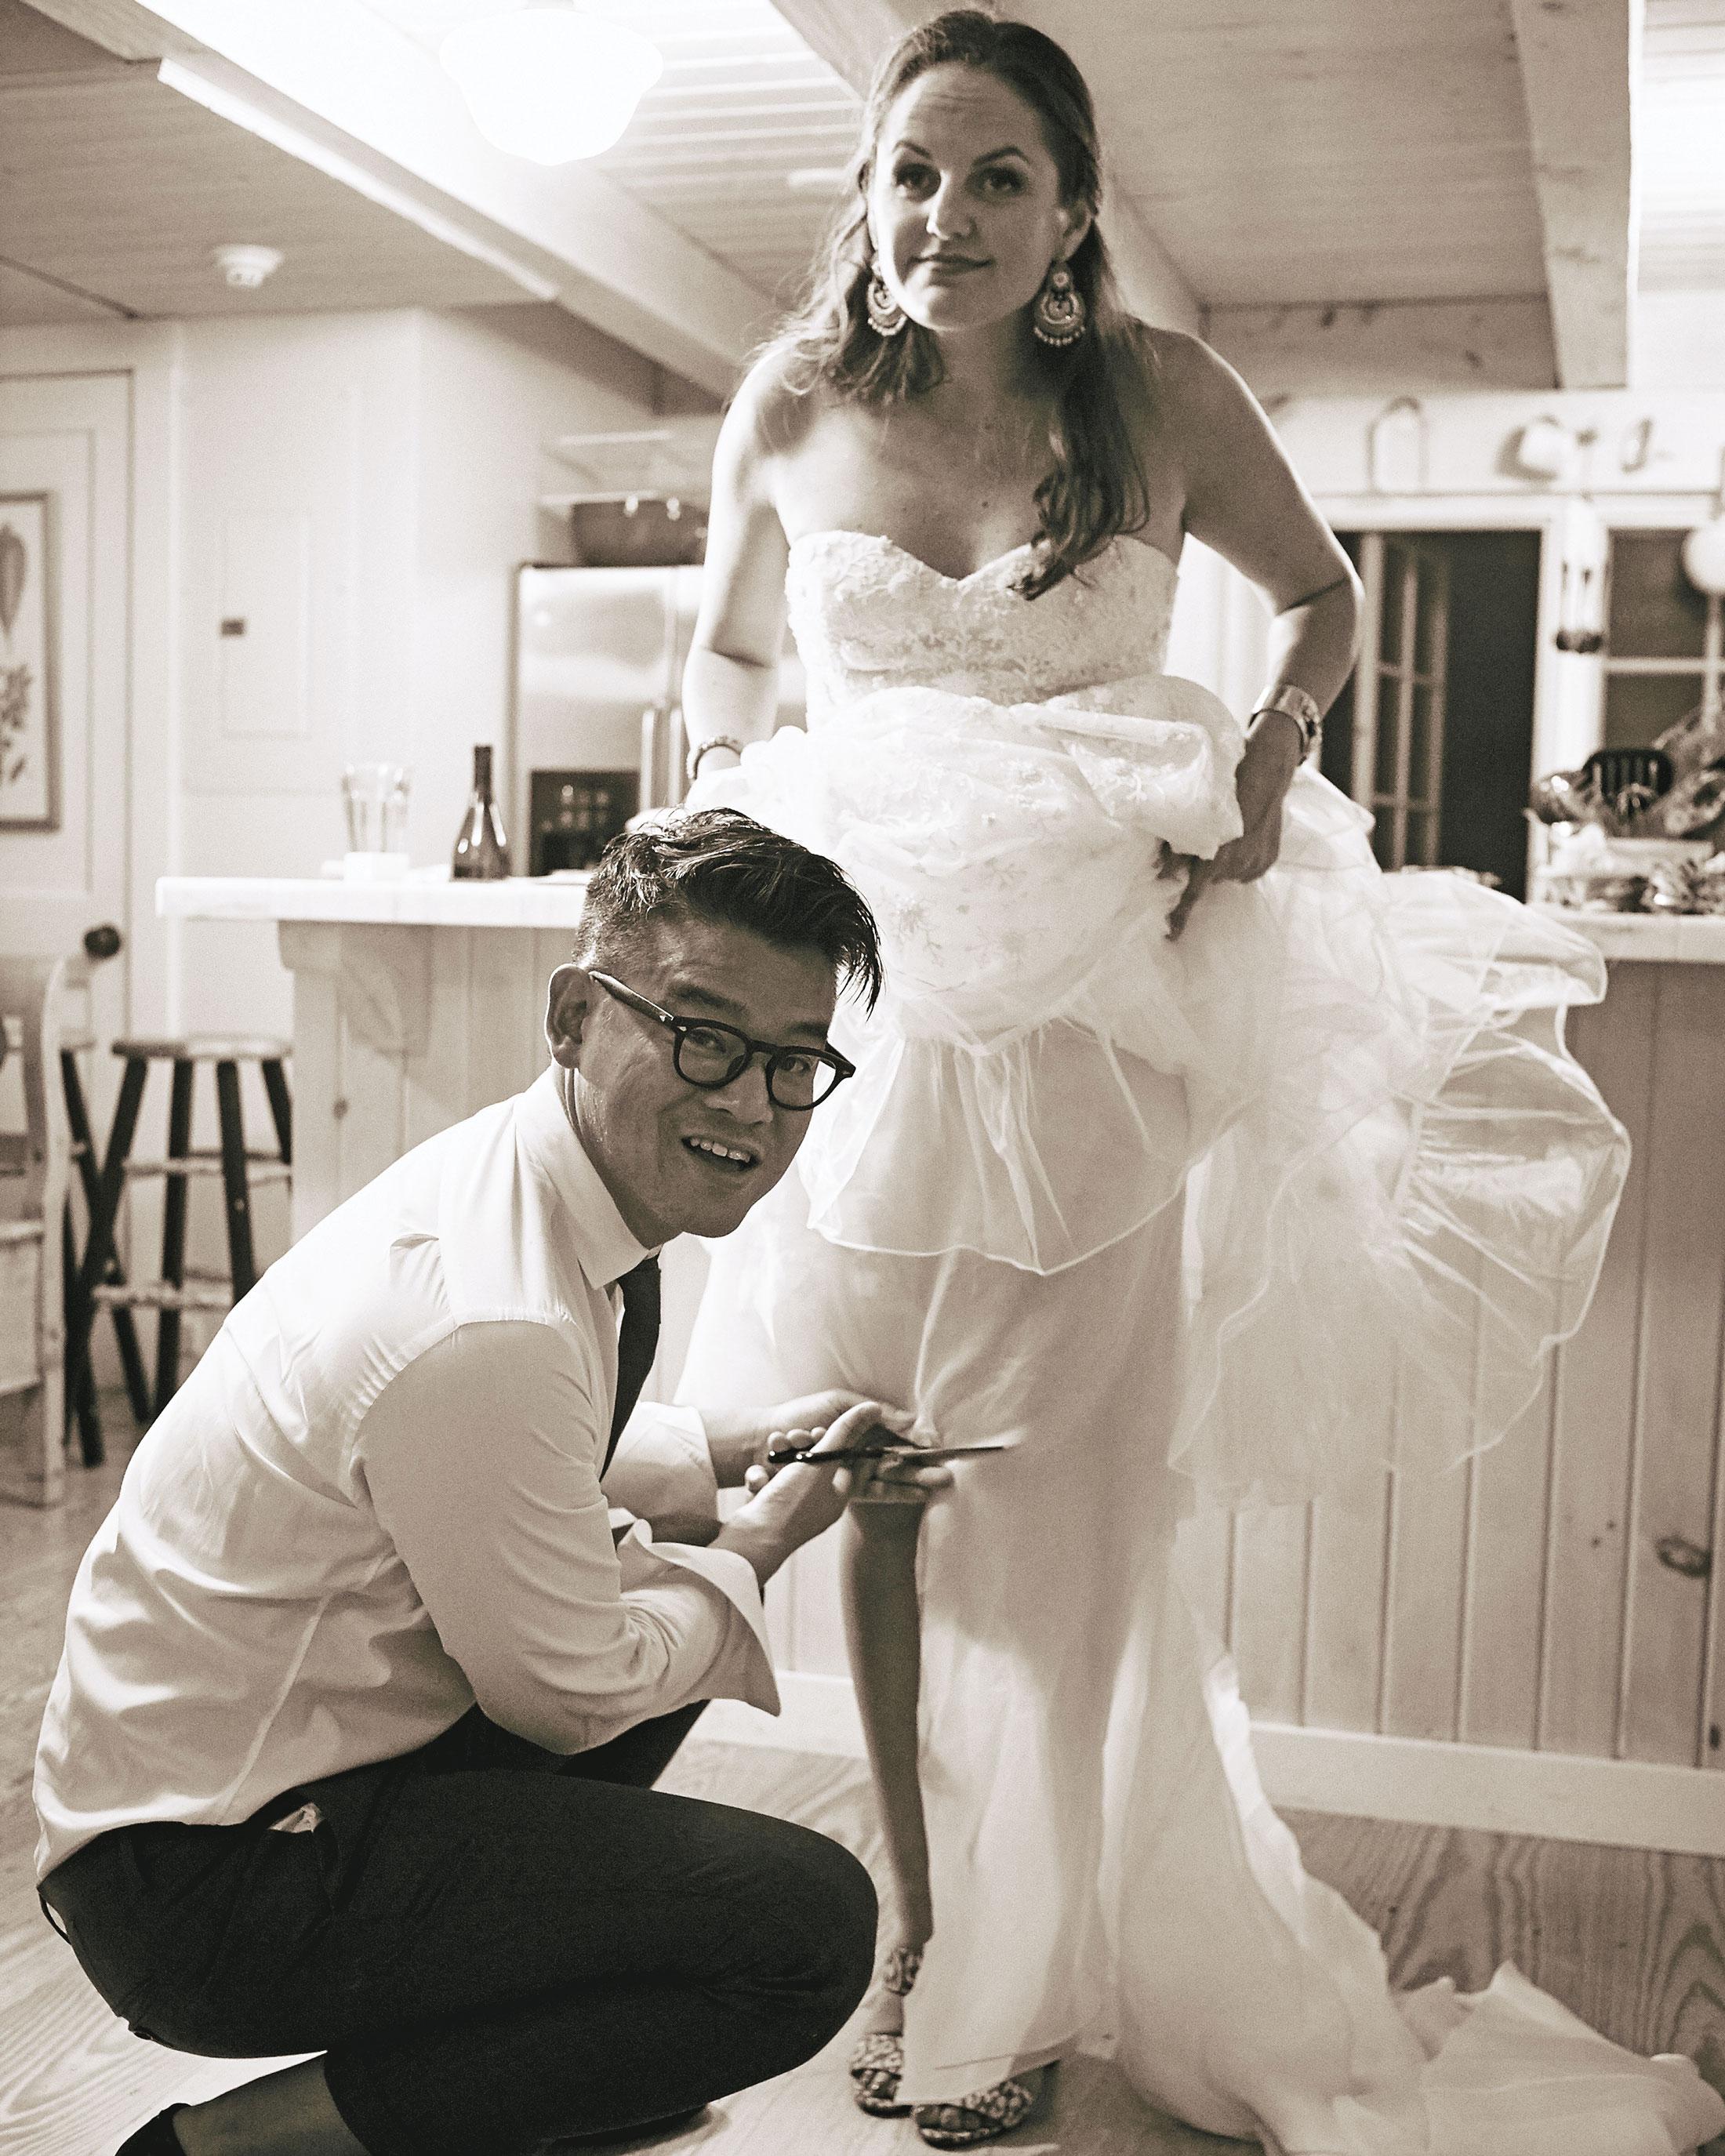 mfiona-peter-wedding-vermont-altering-dress-d3s.600.2015.47-d112512.jpg